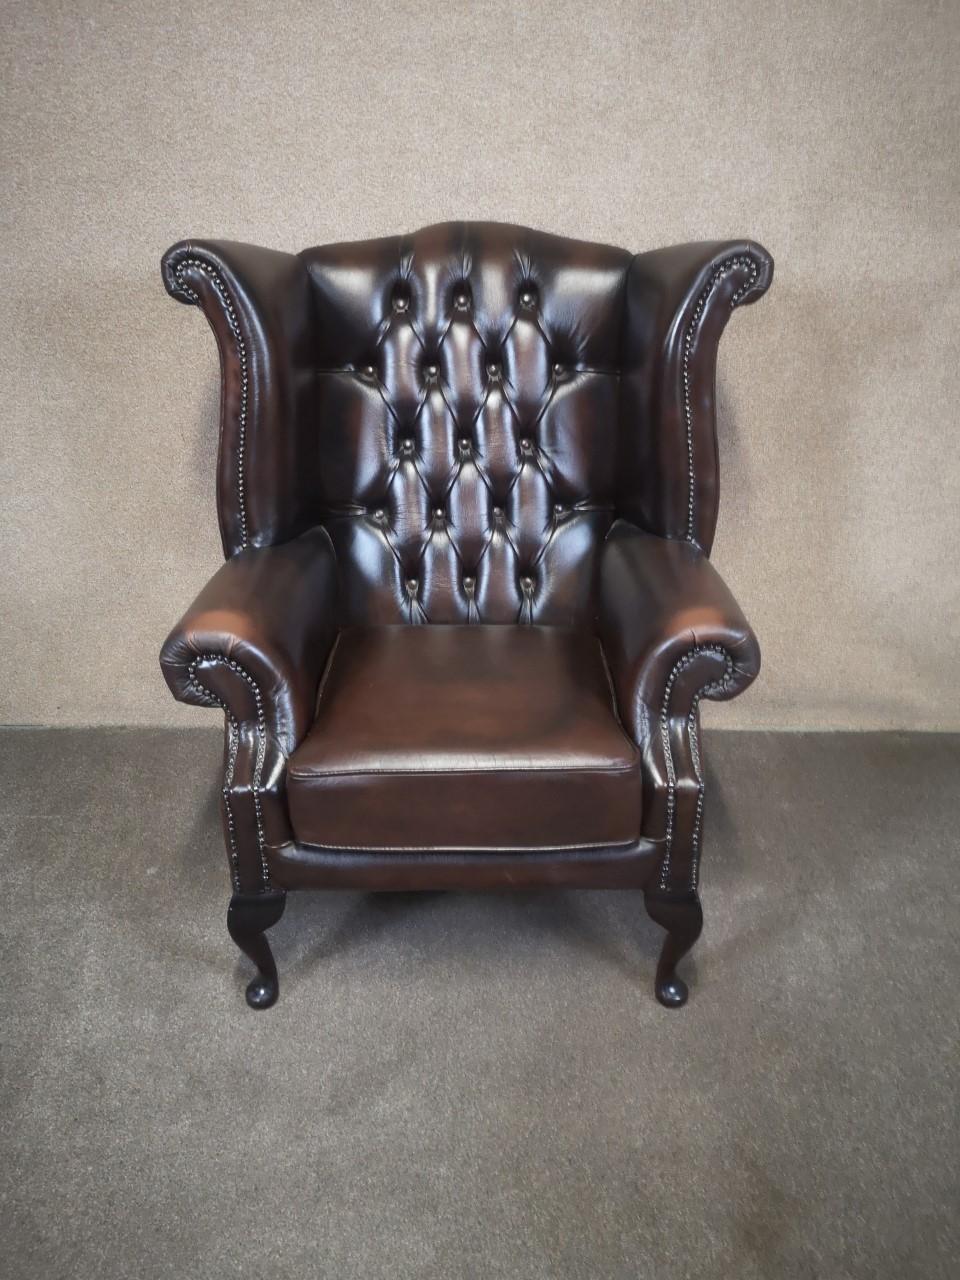 Chesterfield chair画像